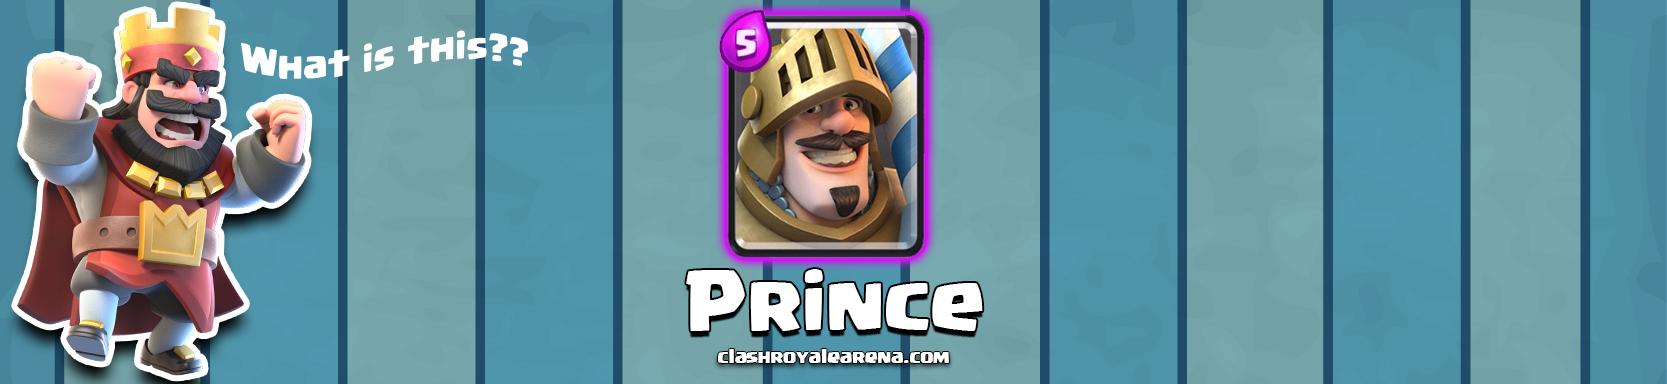 Prince Clash Royale